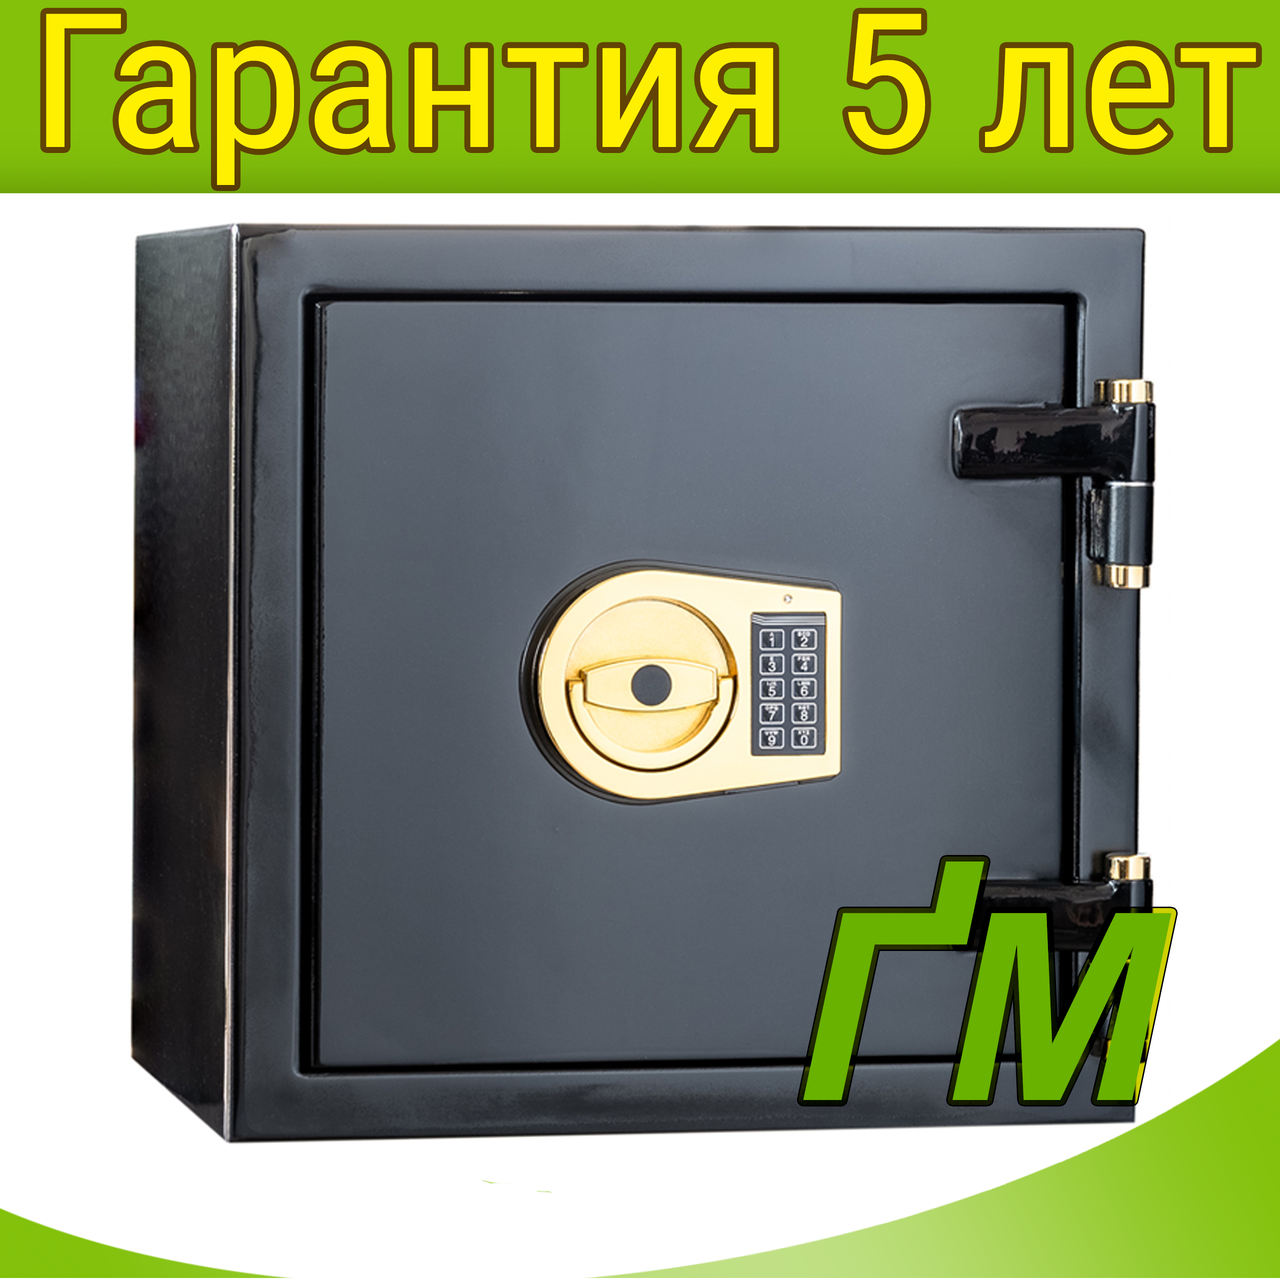 Сейф огневзломостойкий F.30CLI.35.E BLACK GOLD